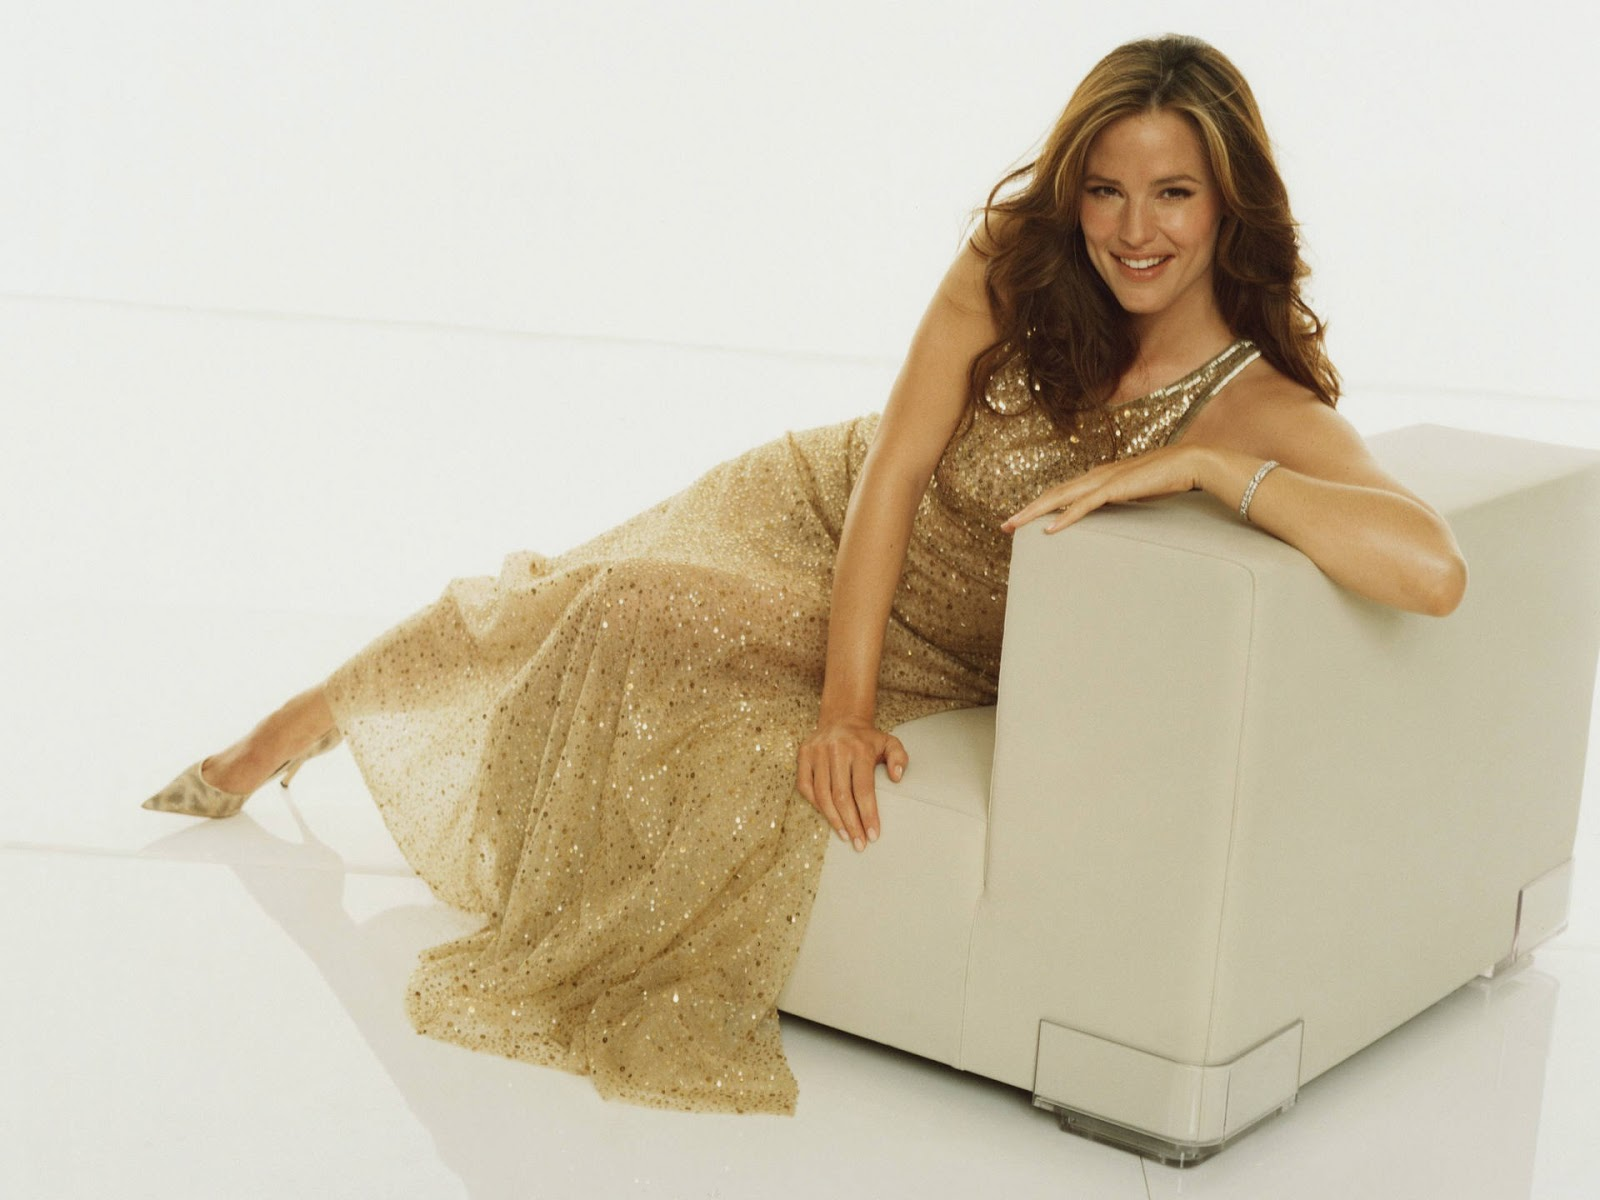 Jennifer Garner Hd Pics, Jennifer Garner Cute Style, Jennifer Garner